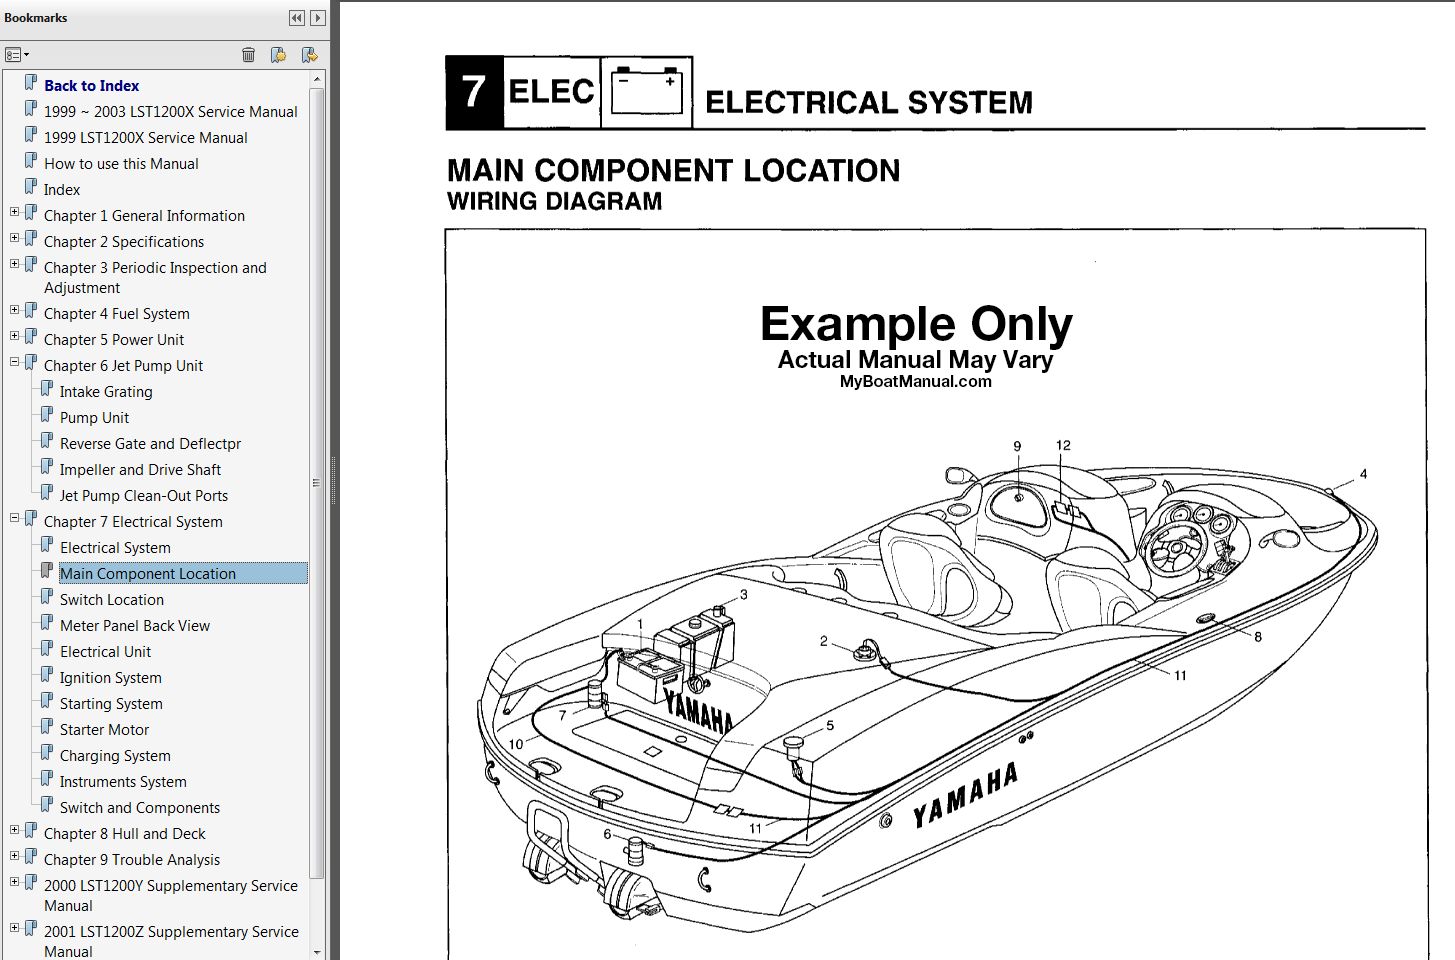 1996 yamaha waveraider 760 manual